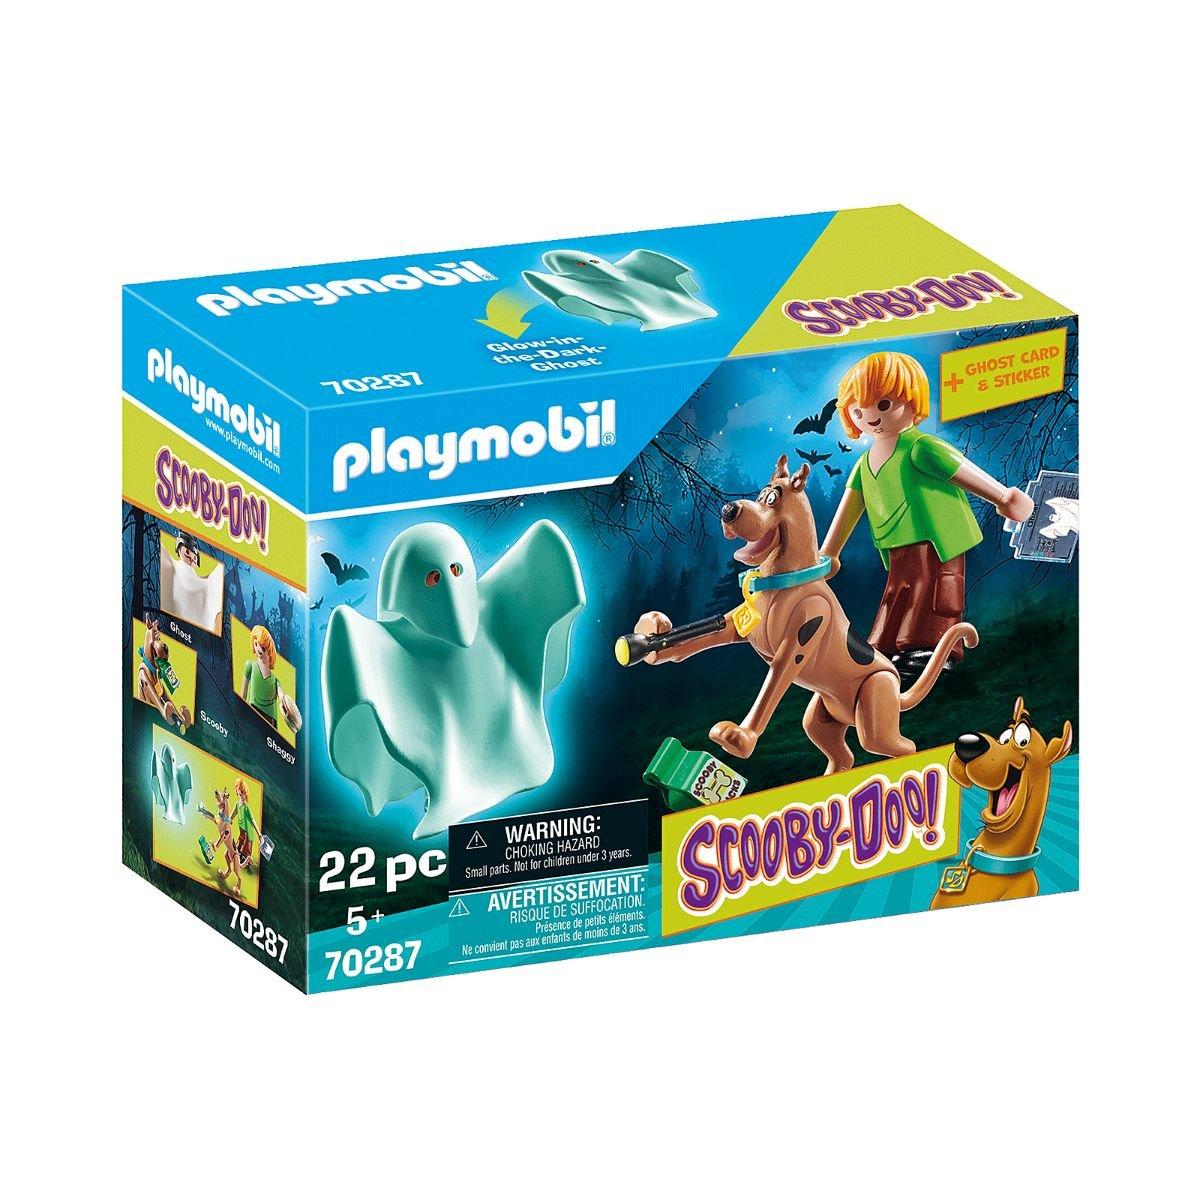 Set Playmobil Scooby Doo - Scooby si Shaggy cu fantoma